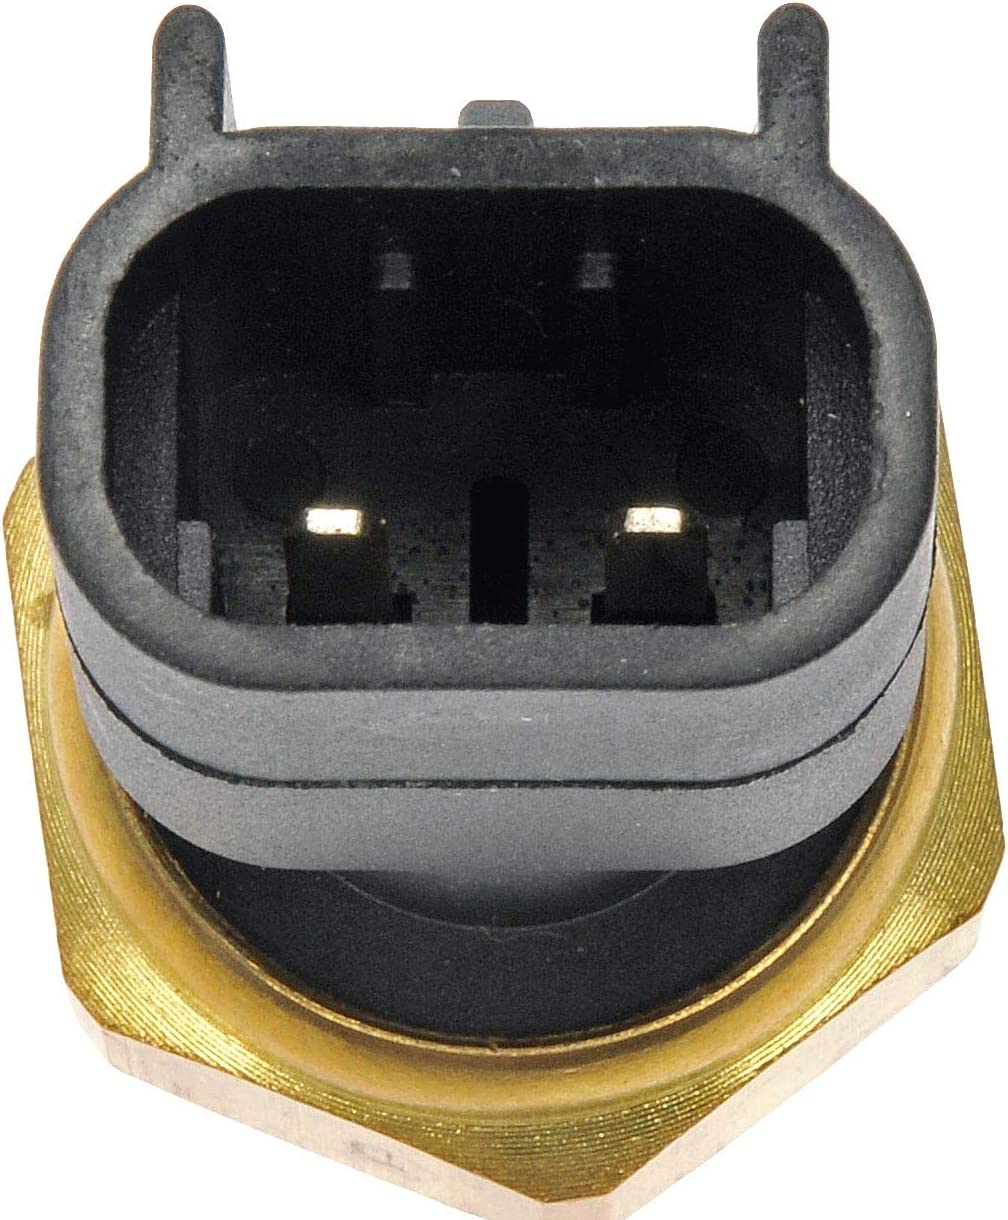 Dorman 505-5203 Engine Coolant Temperature Sensor for Select Freightliner Trucks